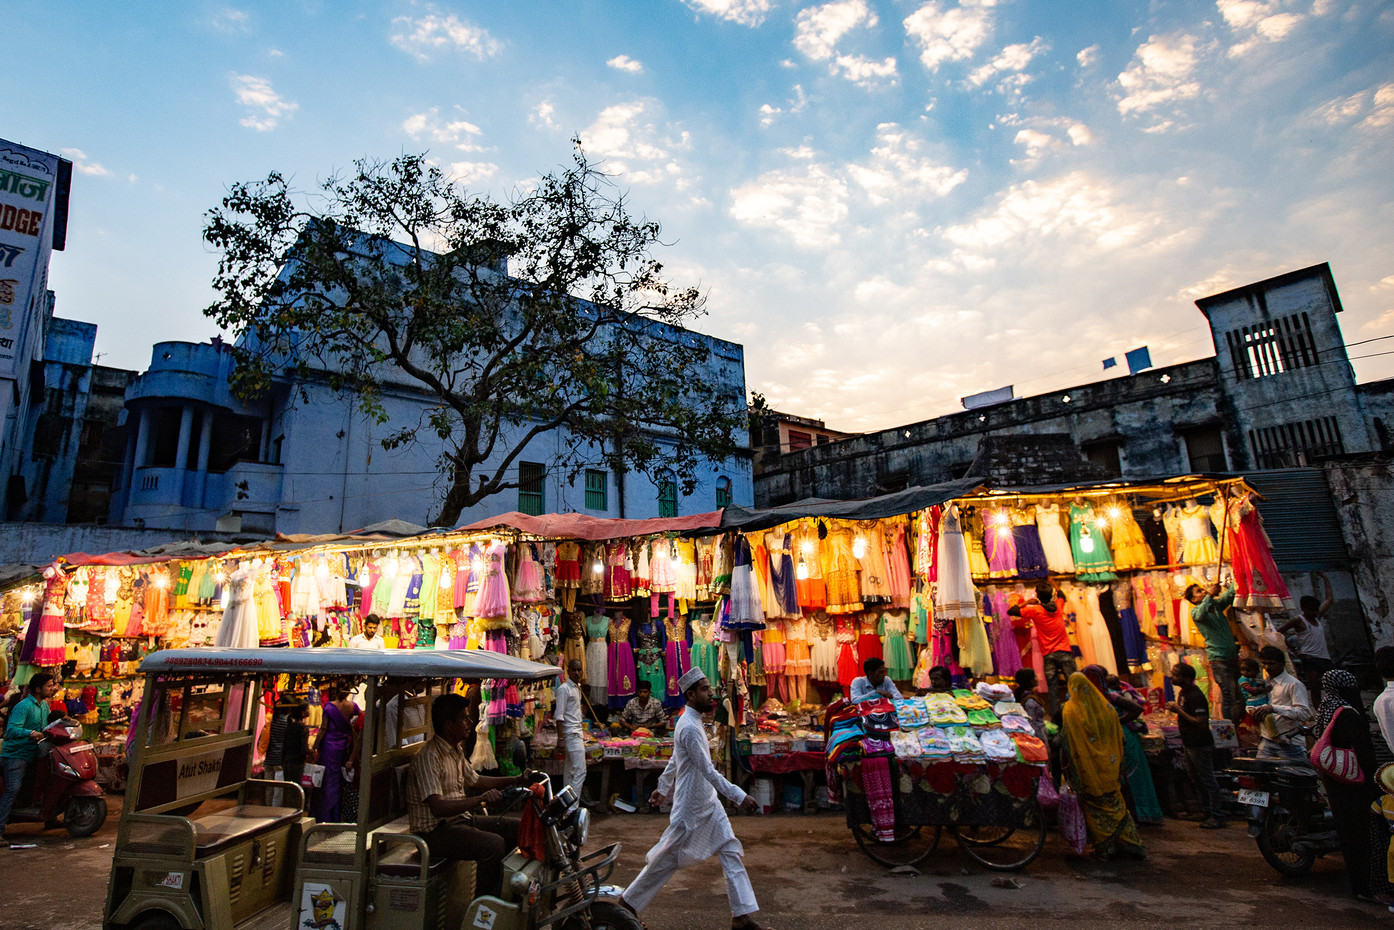 Early evening in Varanasi, India